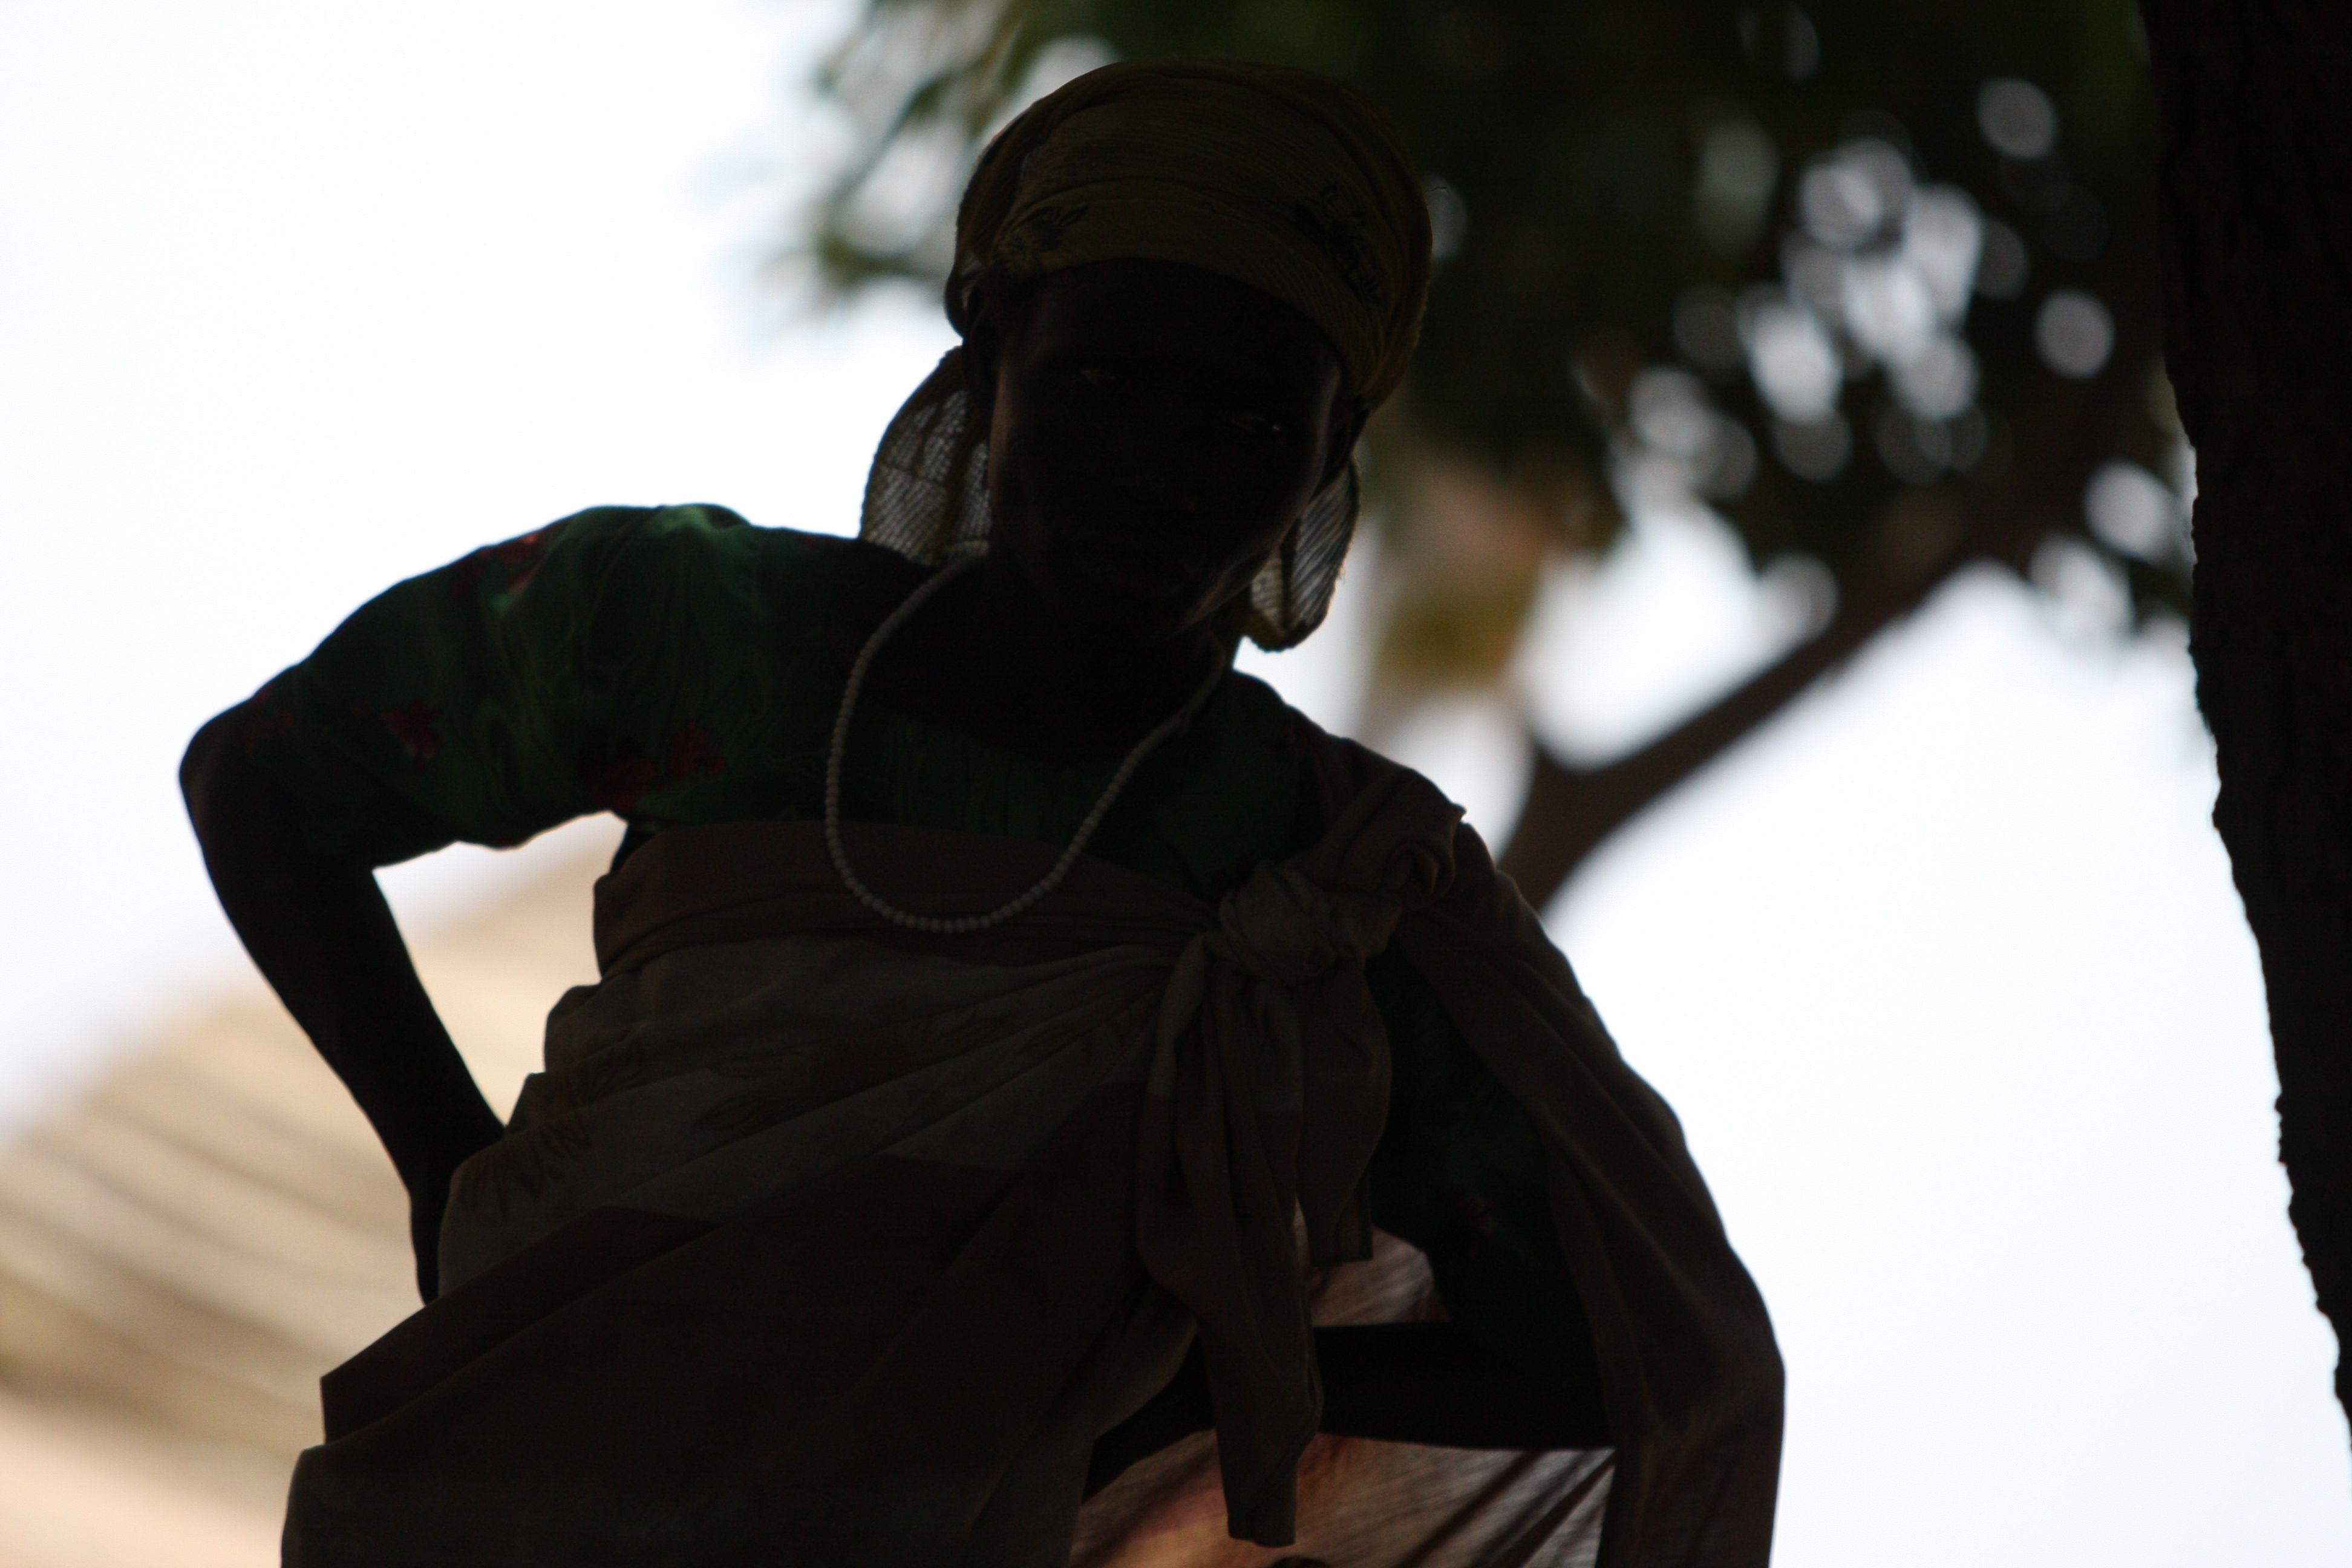 A silhouette of South Sudan